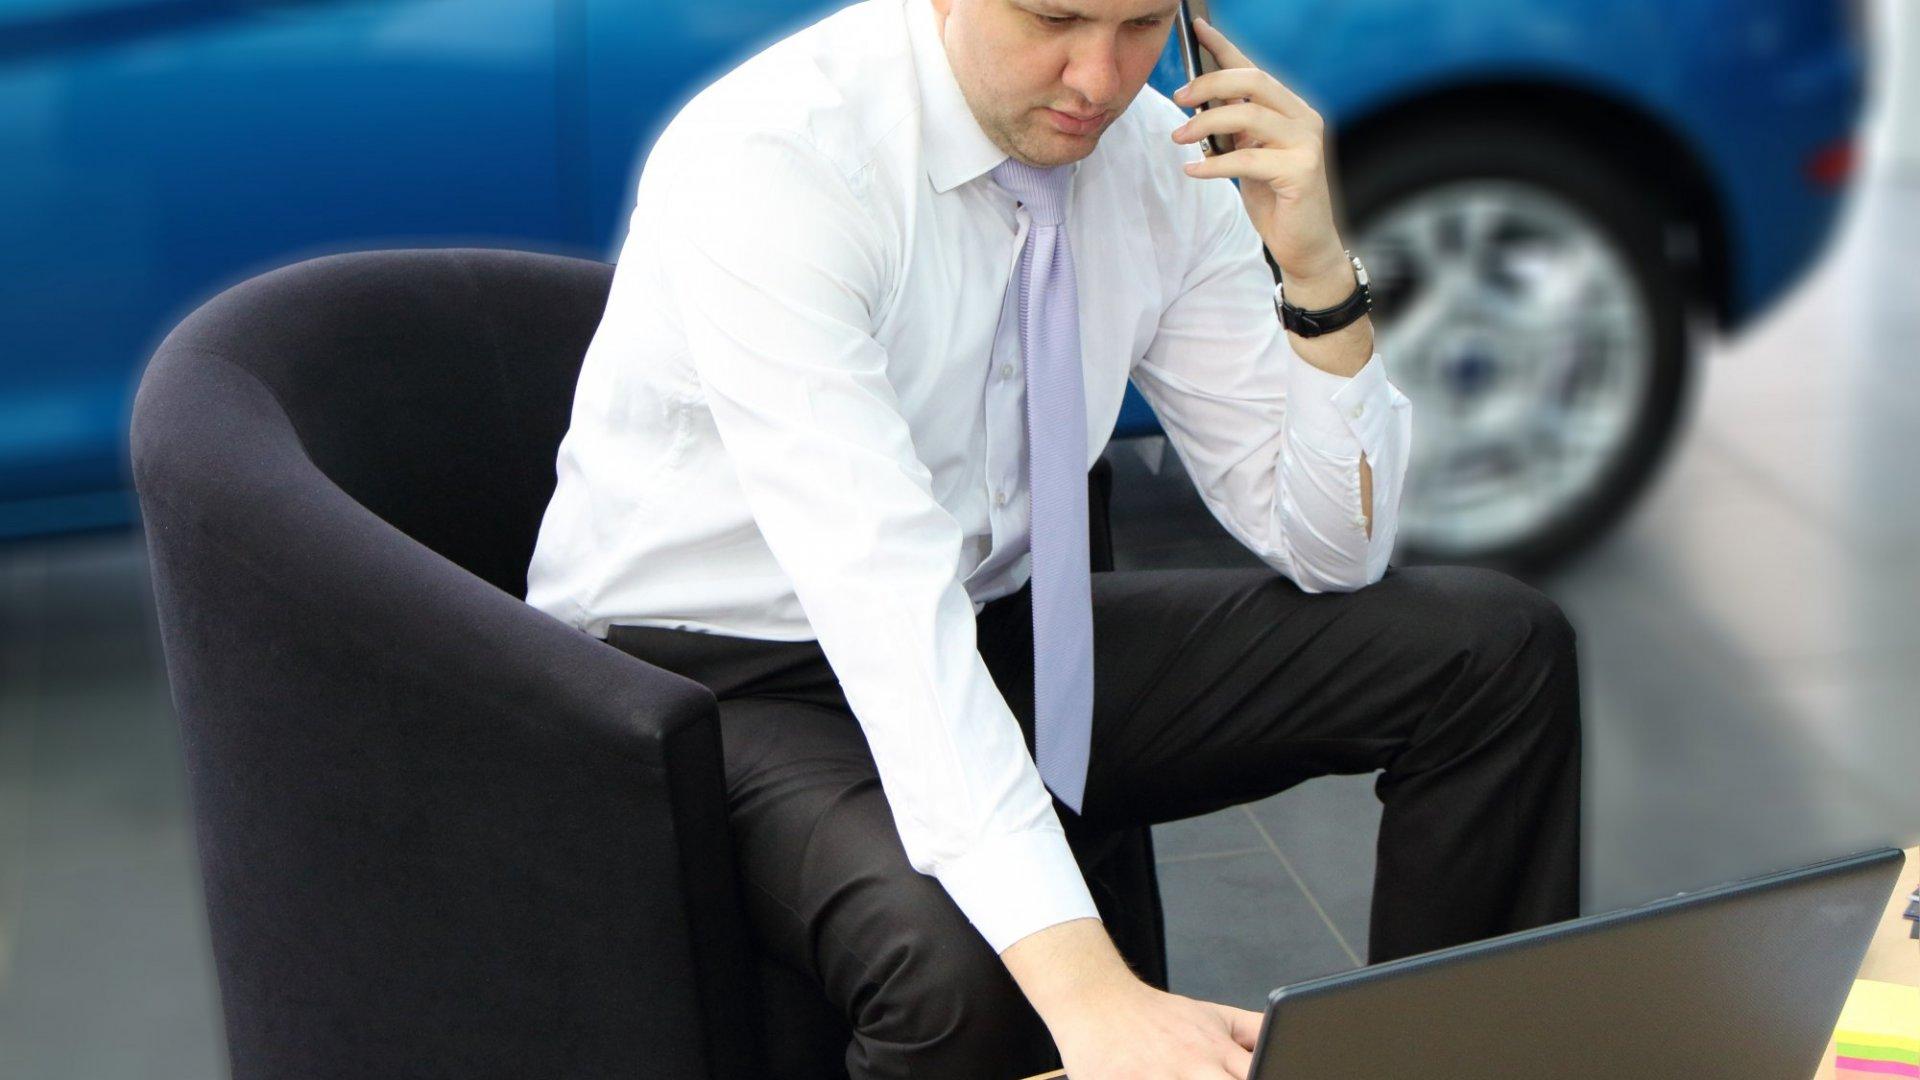 How A Tech Entrepreneur Launched A Company At A Lexus Dealership